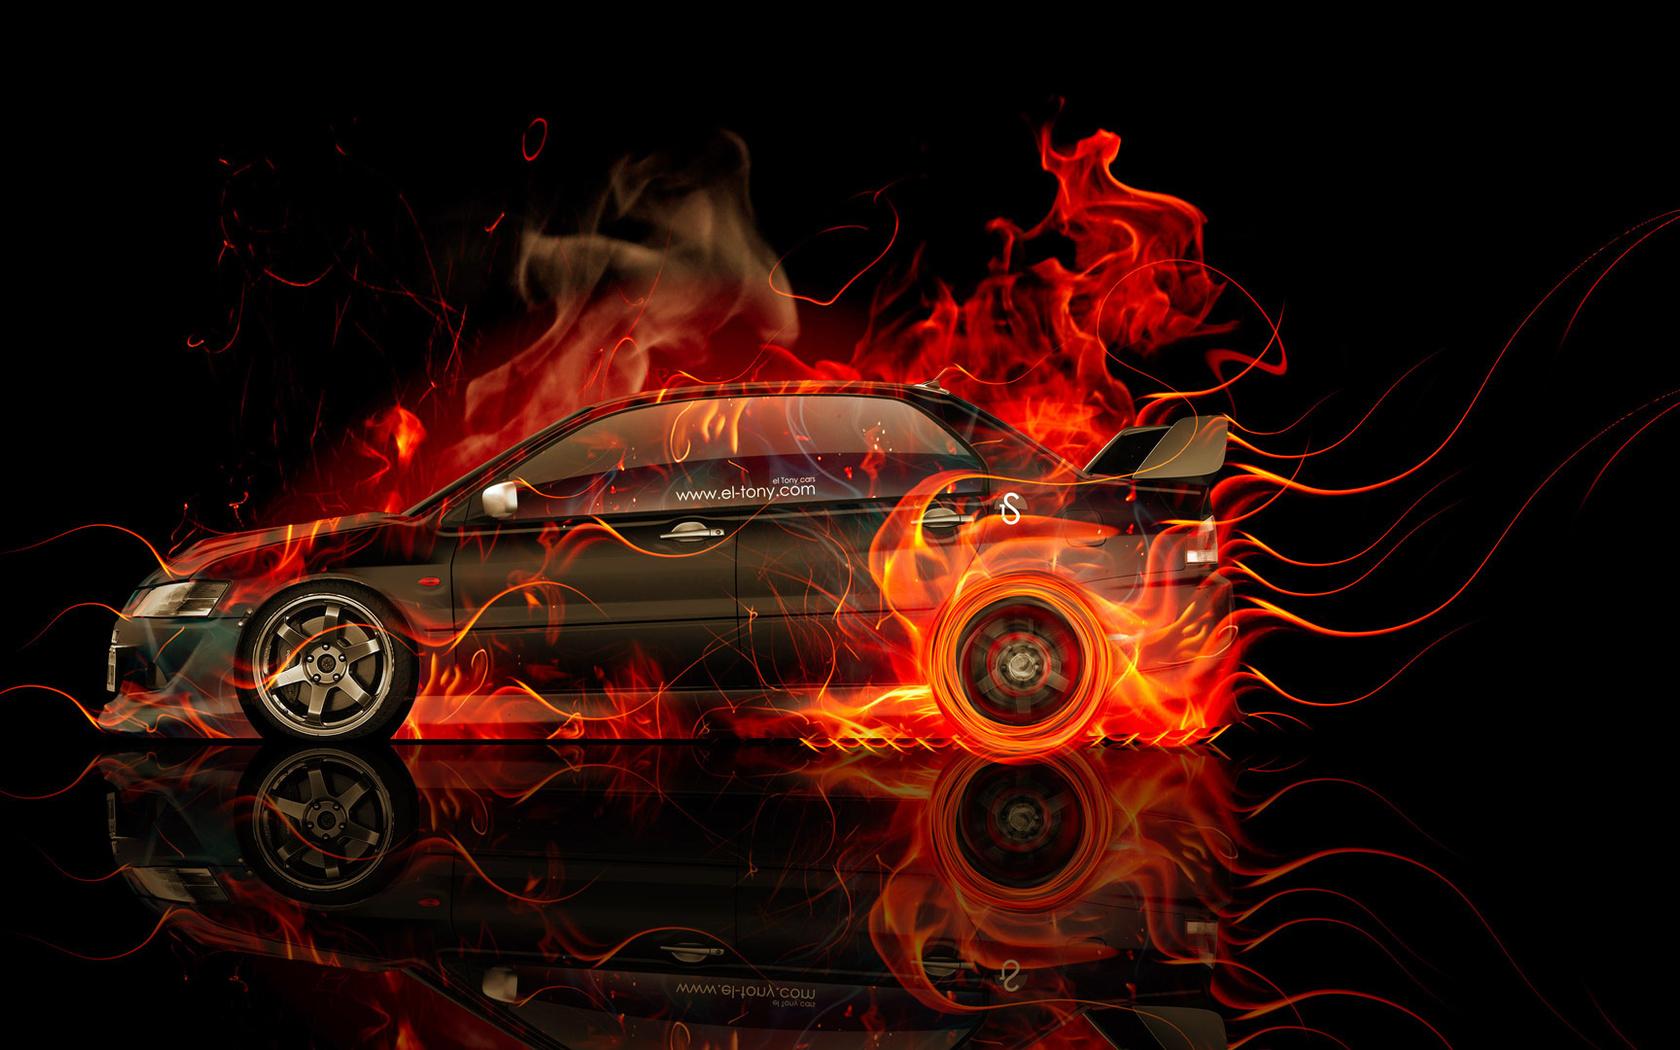 tony kokhan, mitsubishi, lancer, evolution, jdm, side, fire, car, orange, black, flame, el tony cars, photoshop, hd wallpapers, design, art, style, тони кохан, фотошоп, дизайн, митсубиши, лансер, эволюшн, огненная, машина, огненное, авто, обои, арт, стиль